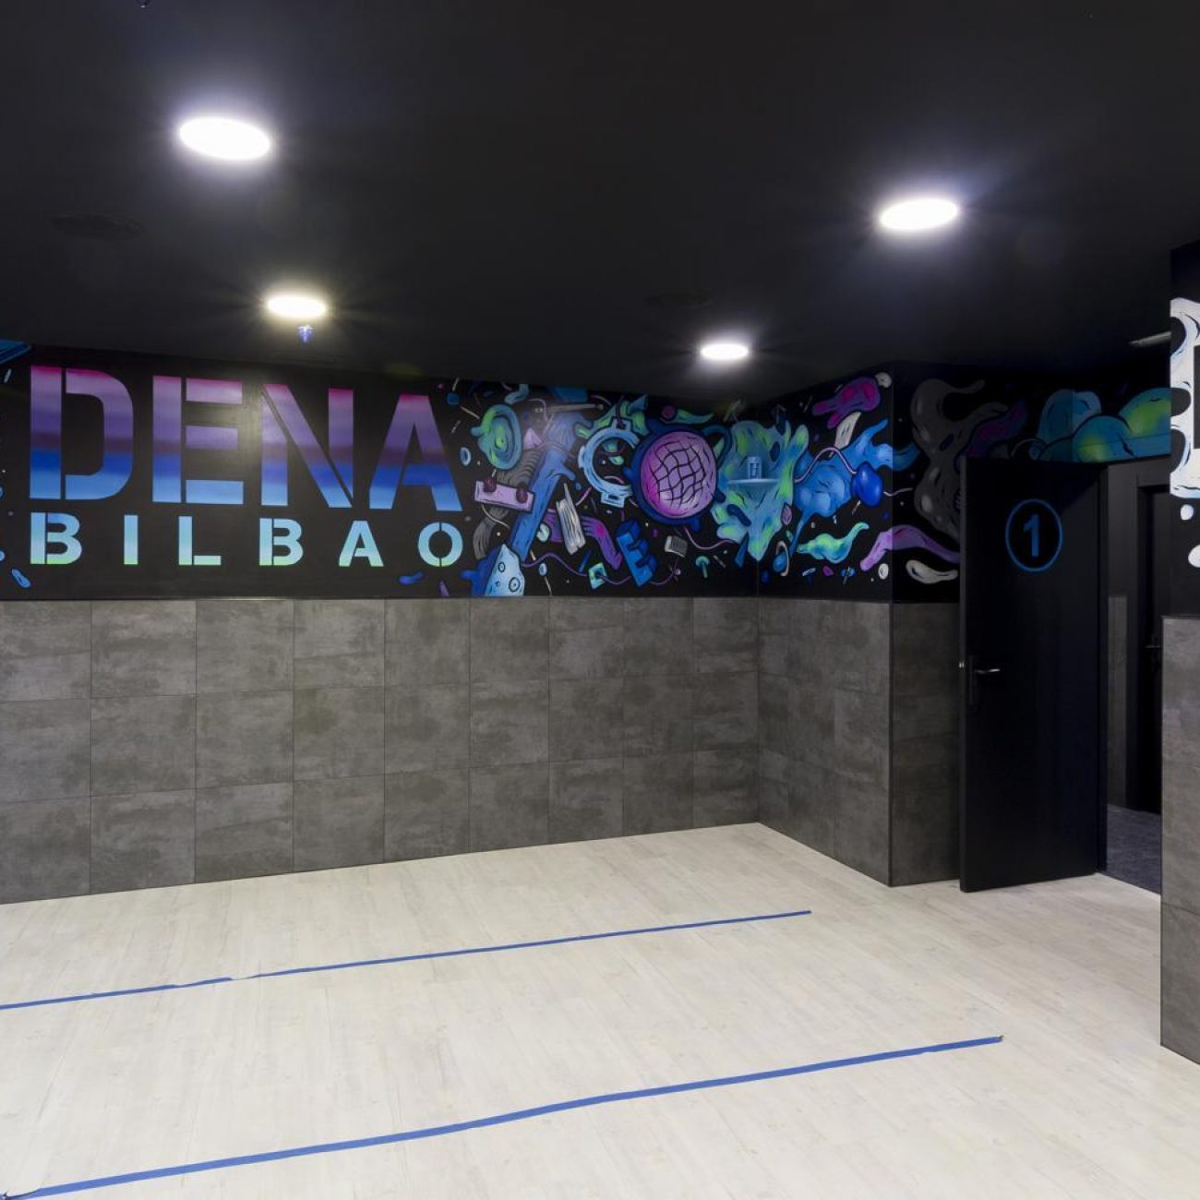 5768-dena-bilbao-02